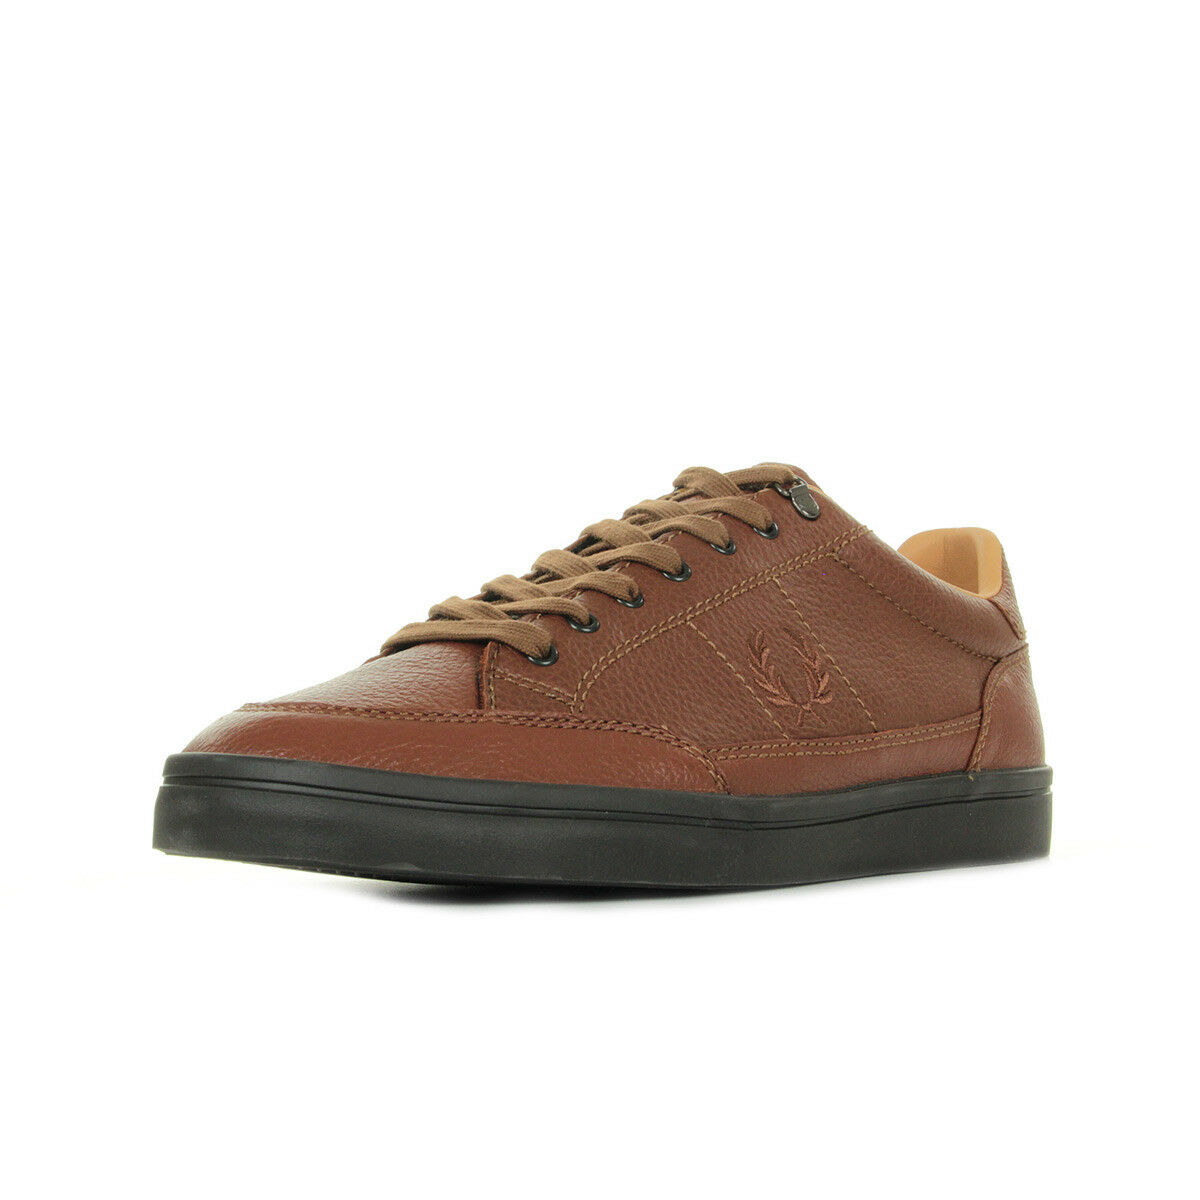 new product 34ad2 ad859 Schuhe Schuhe Schuhe Frot Perry Herren Deuce Premium Leather braun c89860